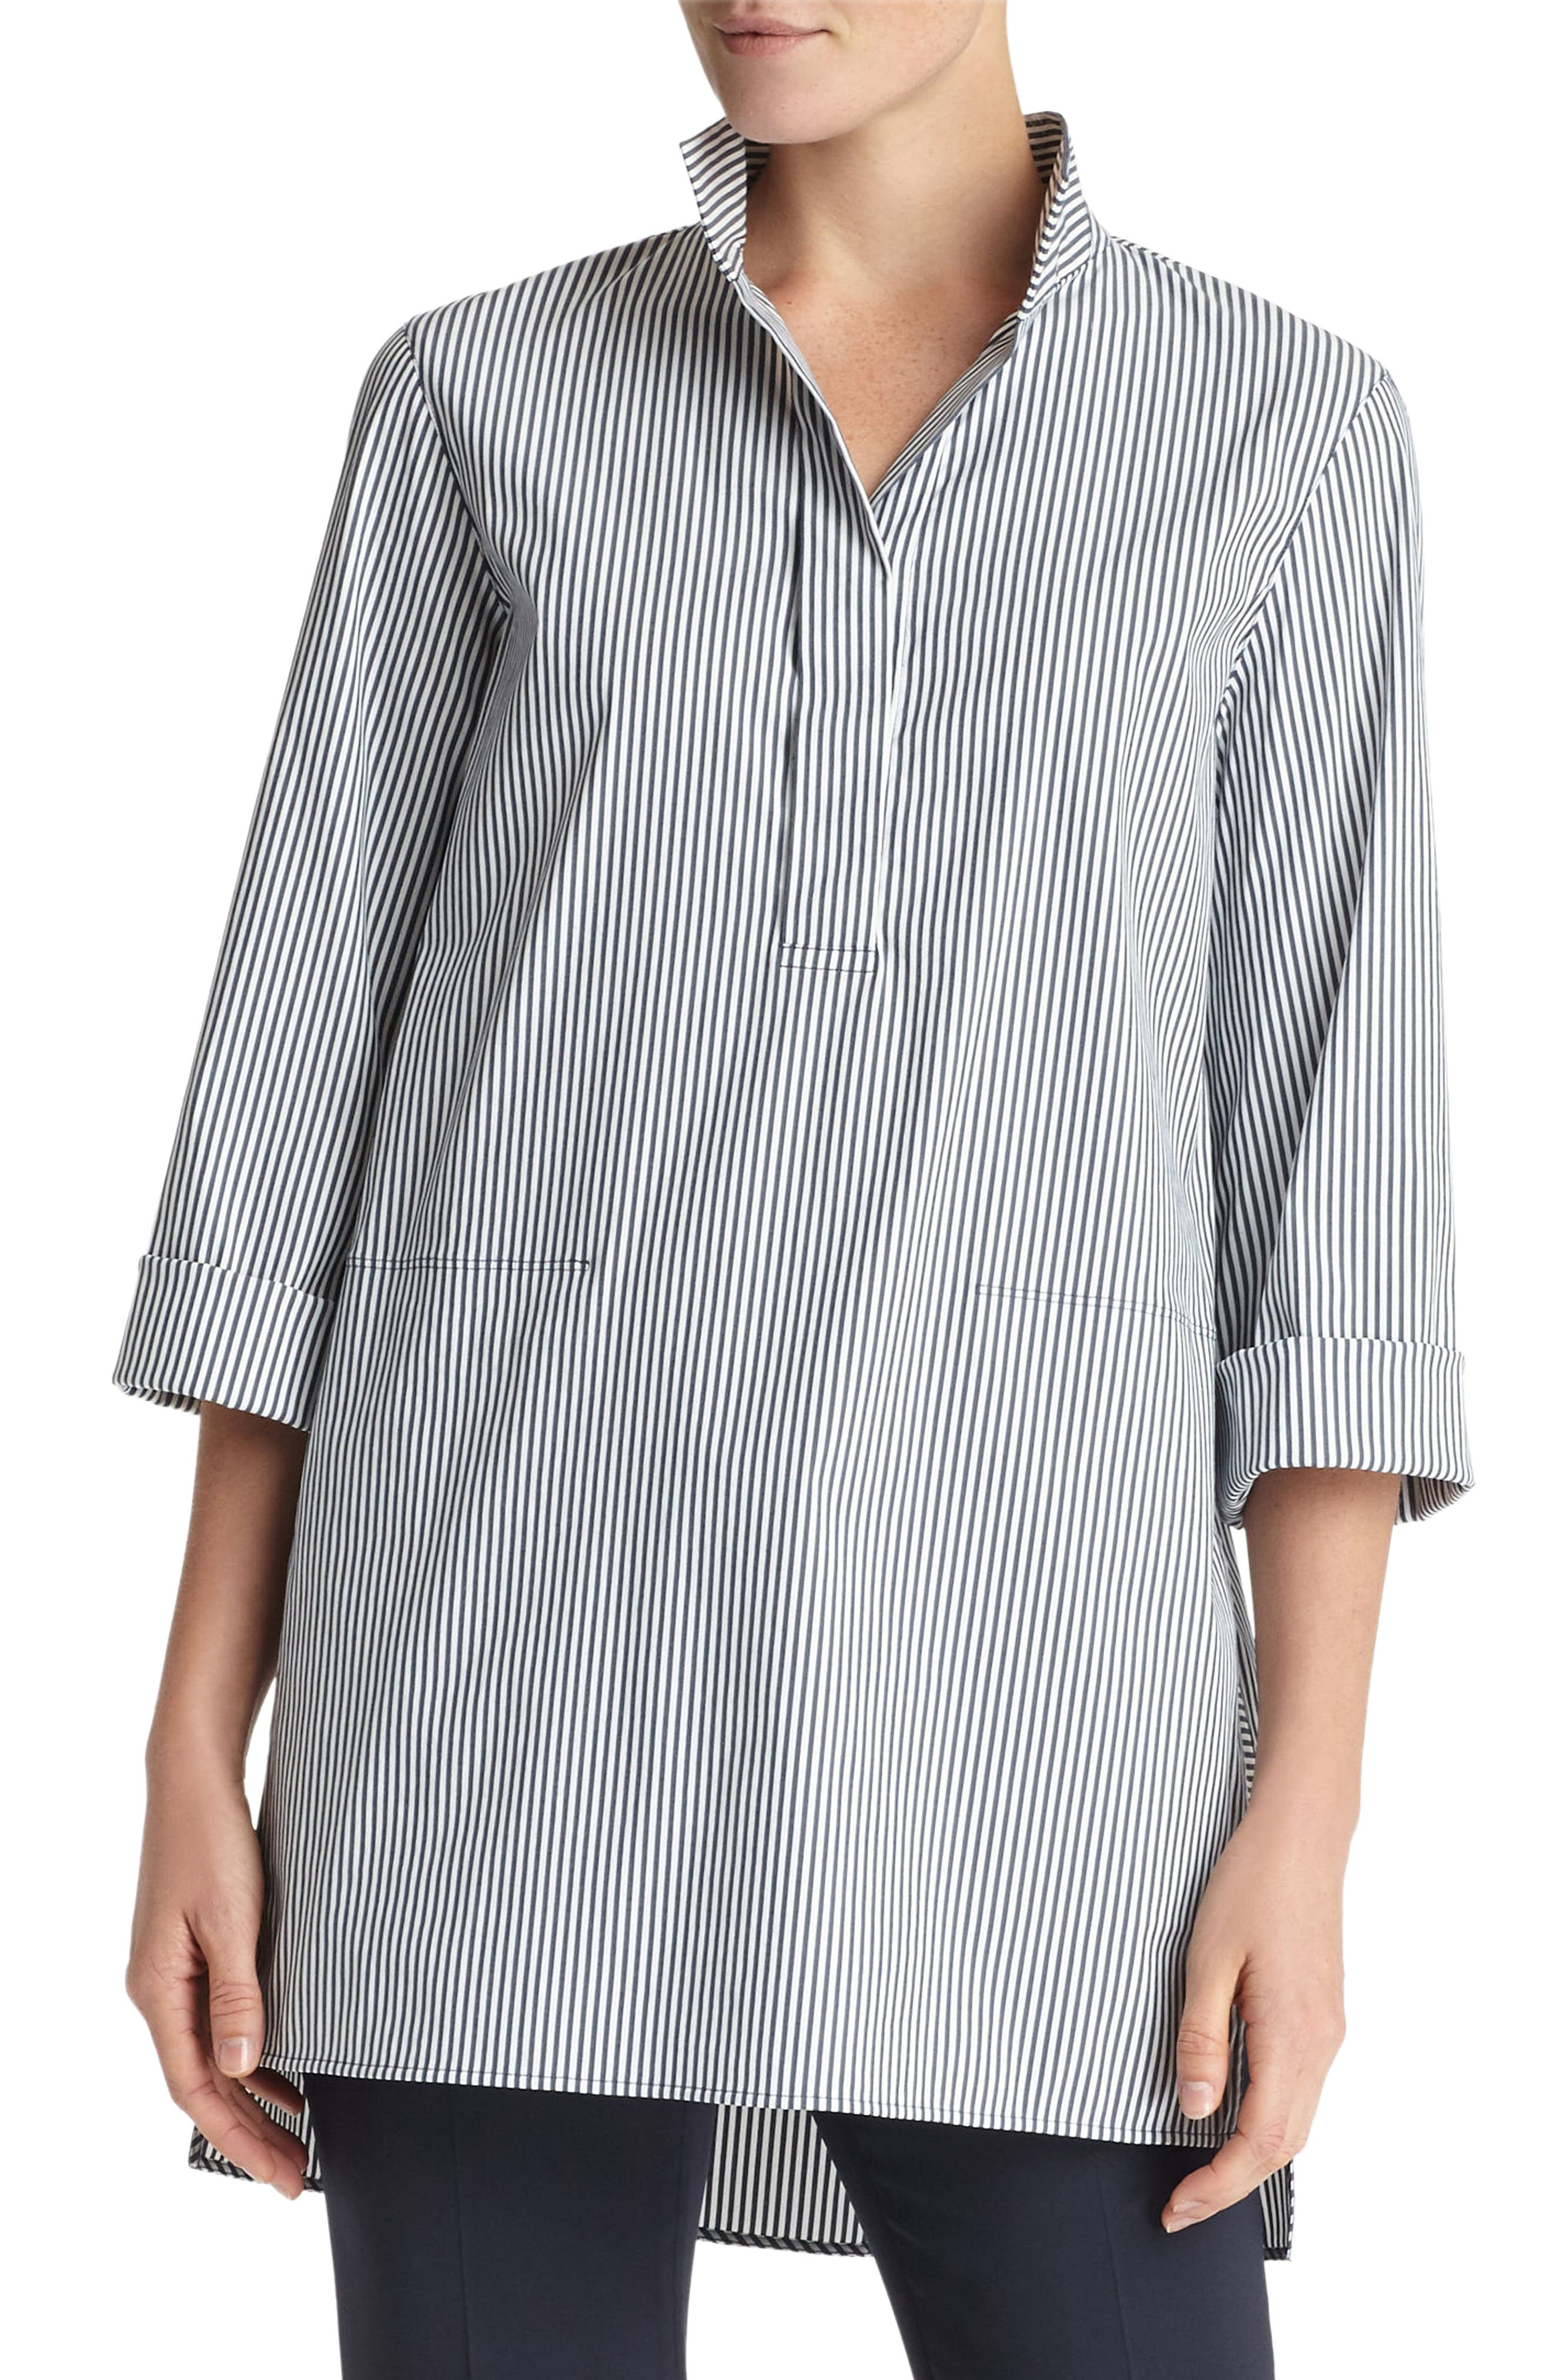 Desirae Freeport Stripe Shirting Blouse,                             Main thumbnail 1, color,                             Admiral Blue Multi